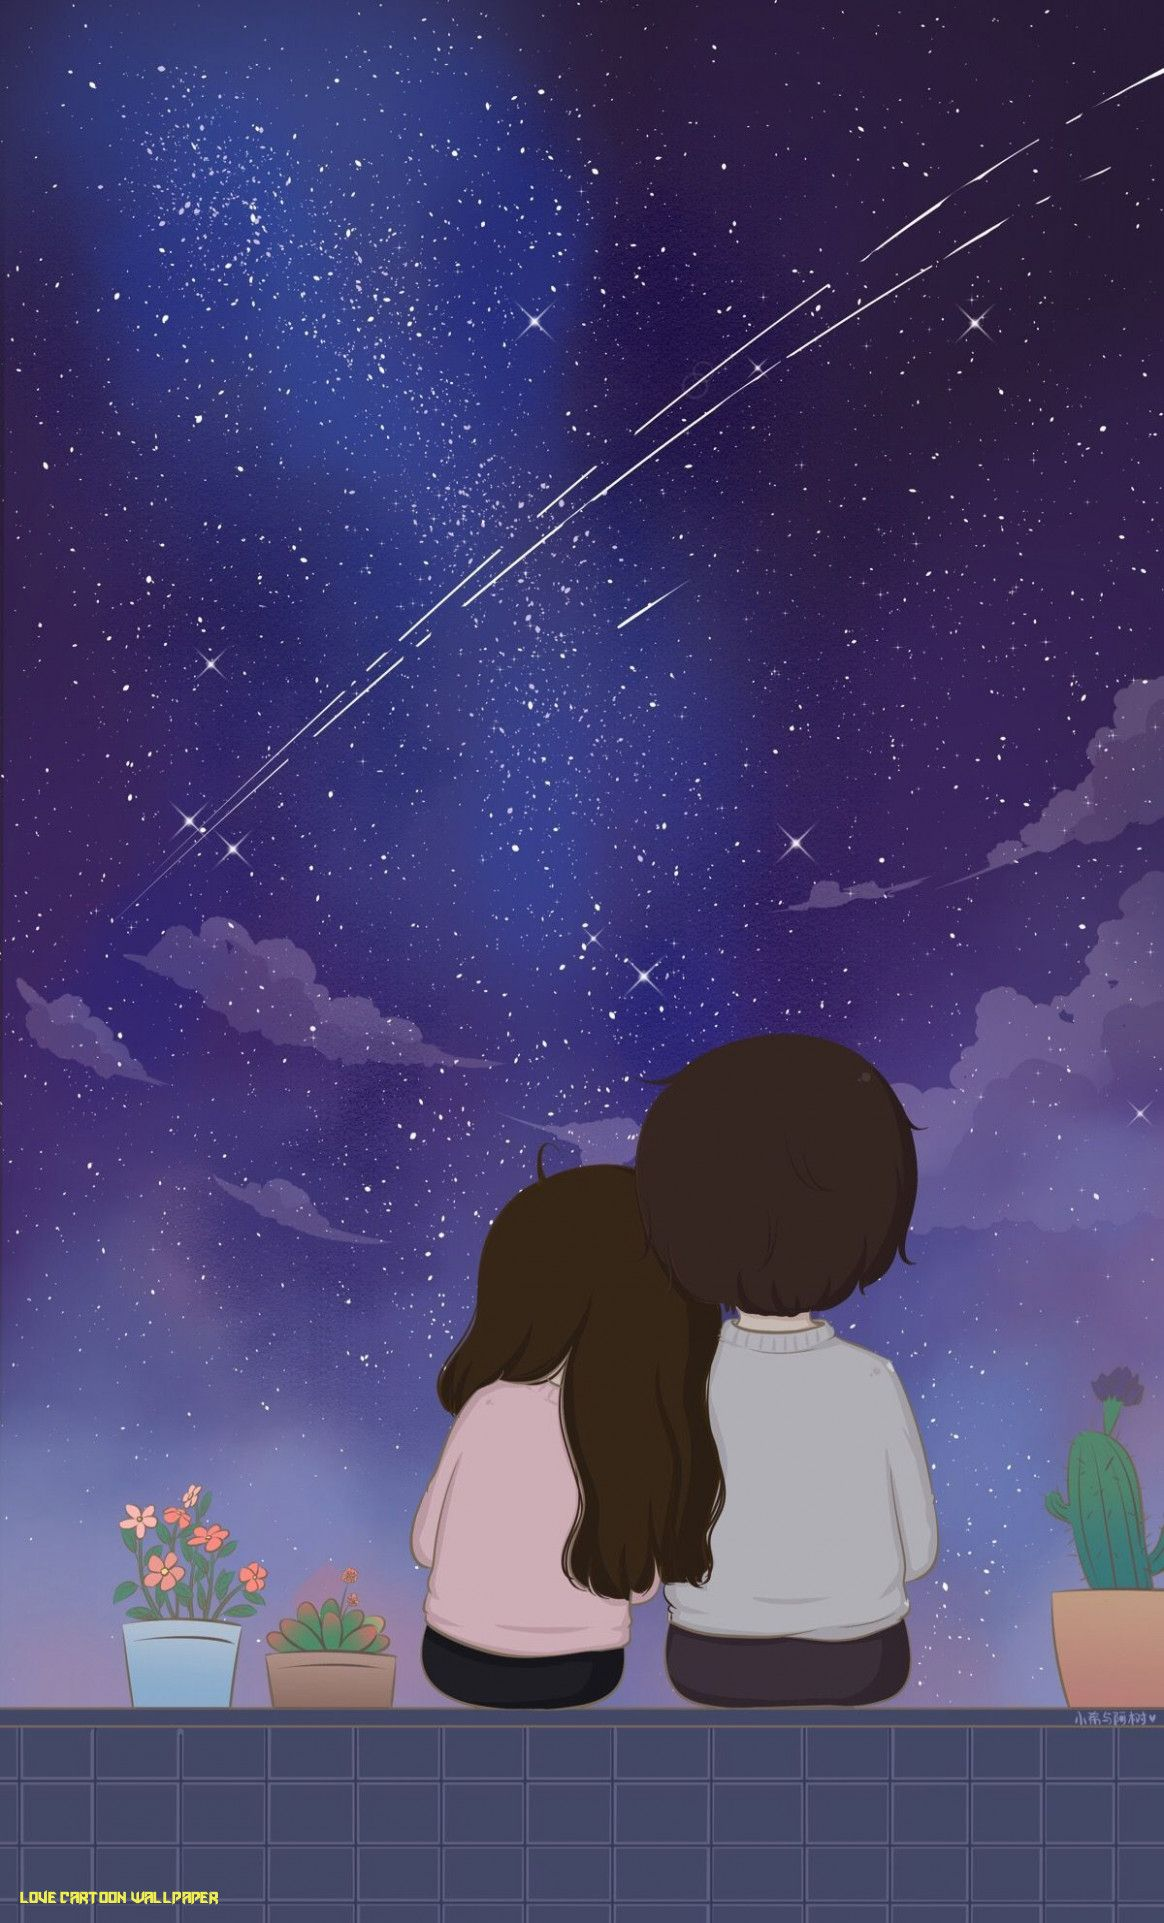 Cute Cartoon Love Wallpapers Top Free Cute Cartoon Love Backgrounds Wallpaperaccess